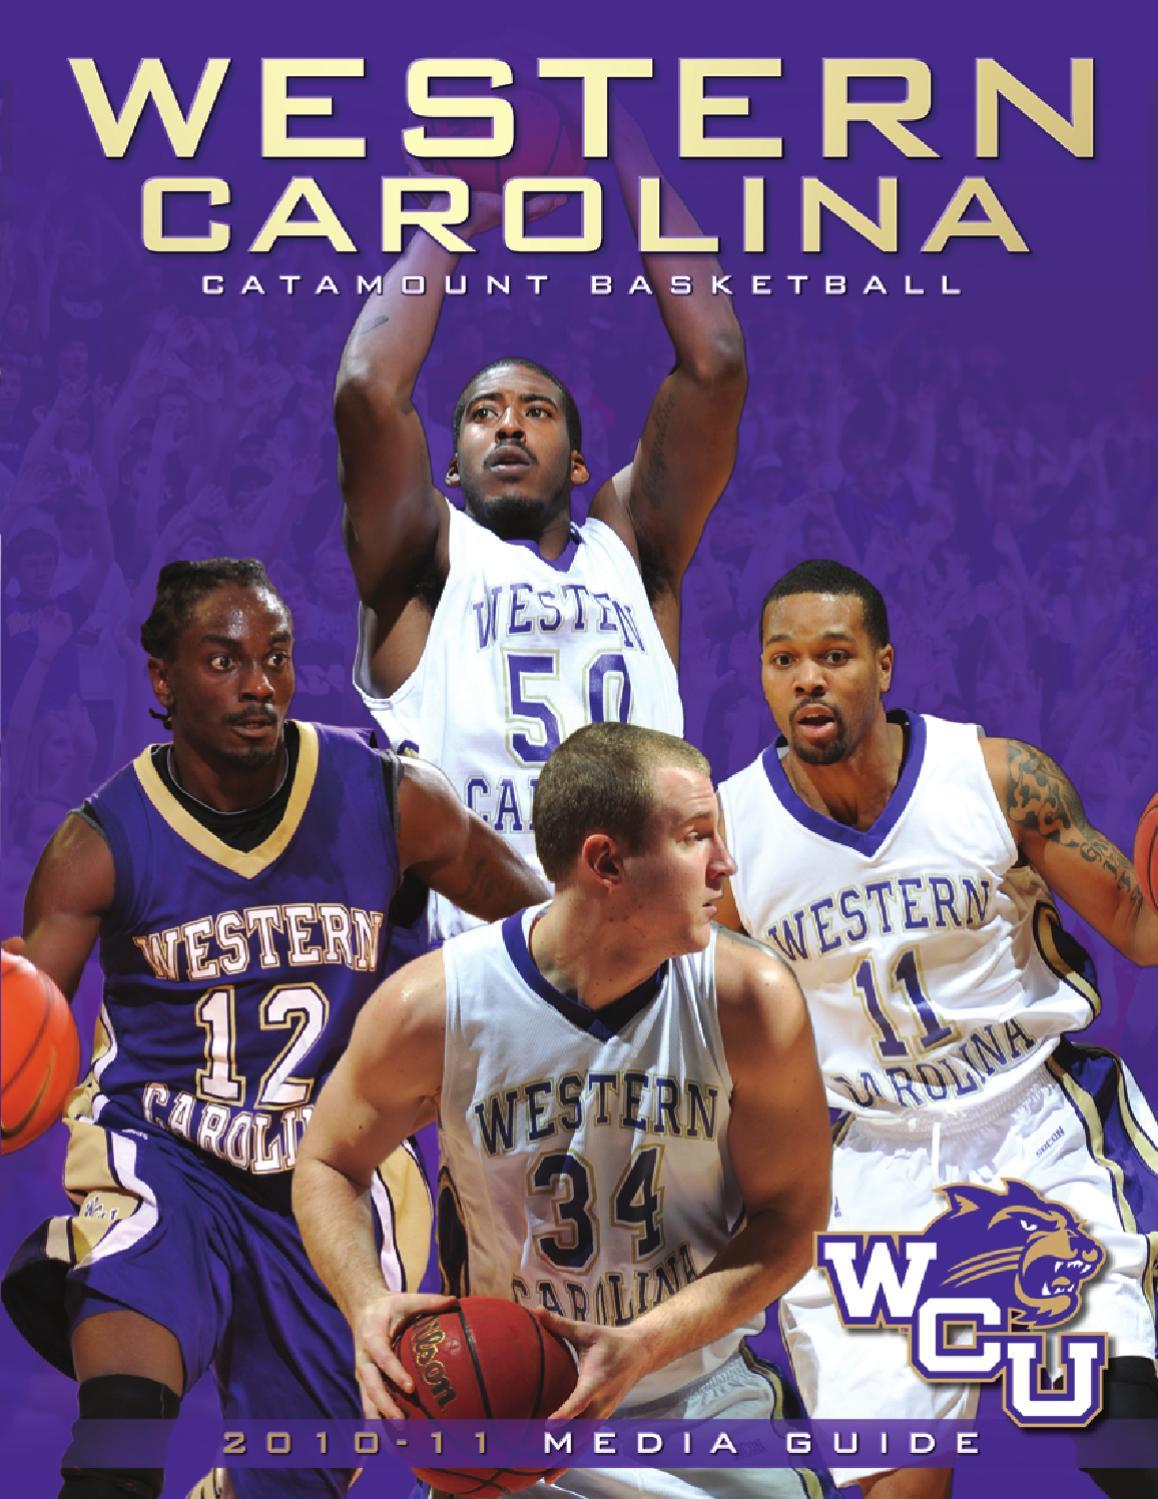 sale retailer bbc83 19708 2010-11 Catamount Men s Basketball Guide by Western Carolina University  Athletics - issuu